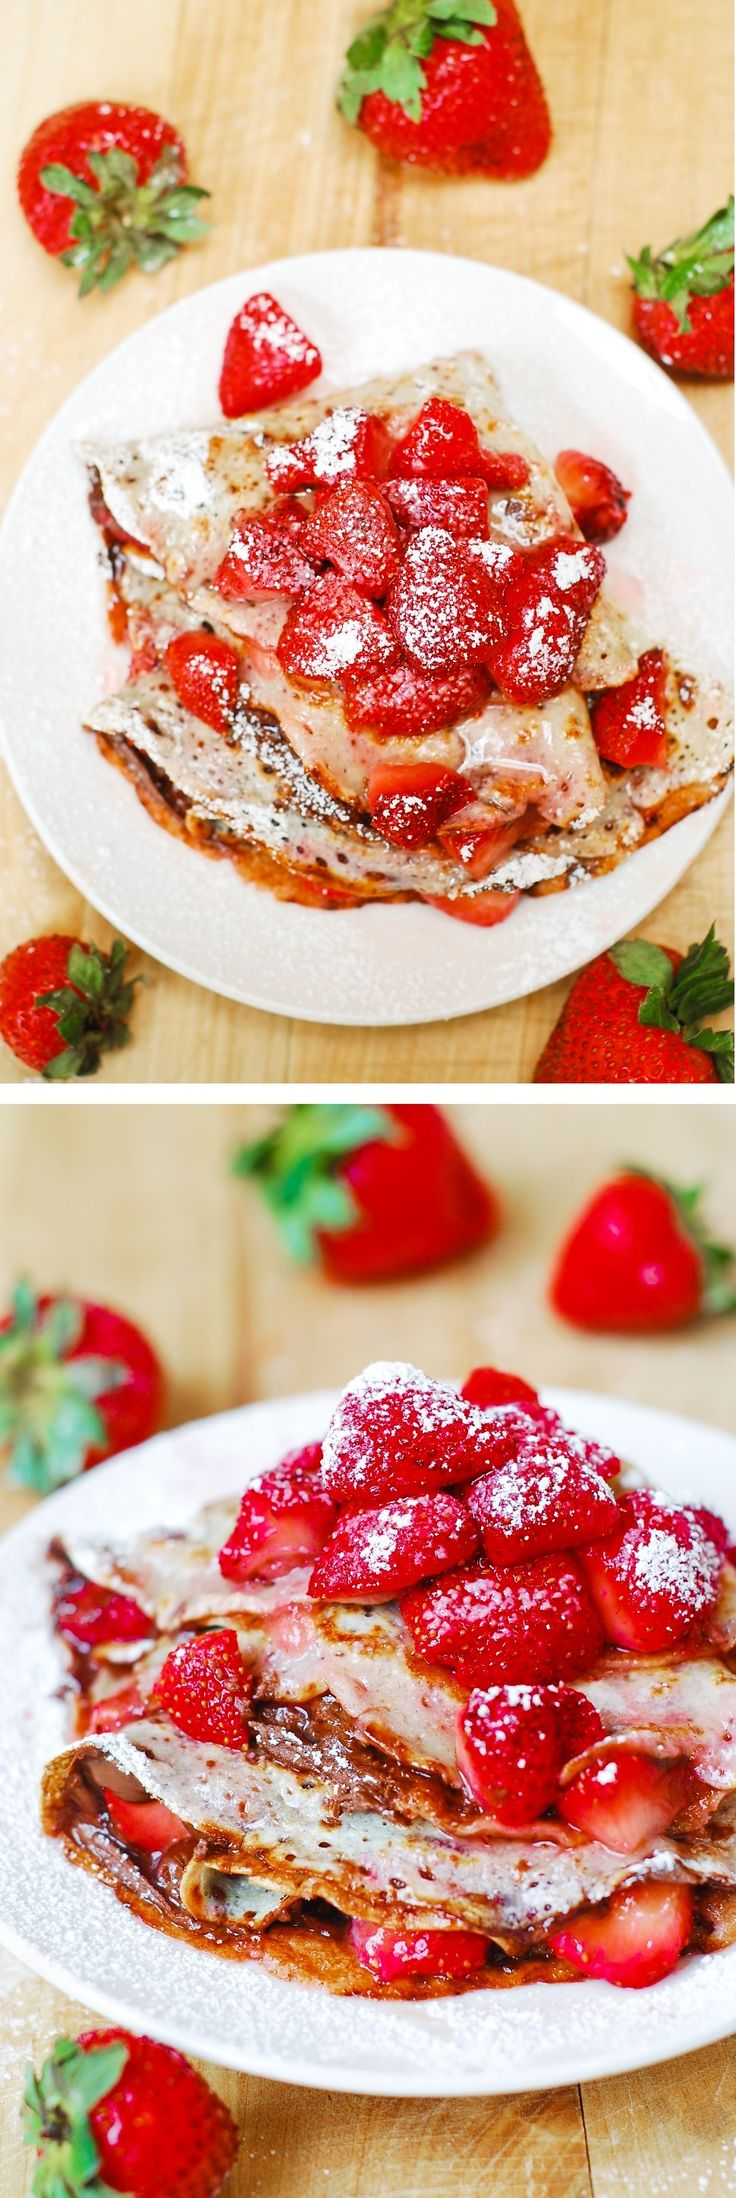 Strawberry and Nutella crepes | Recipe